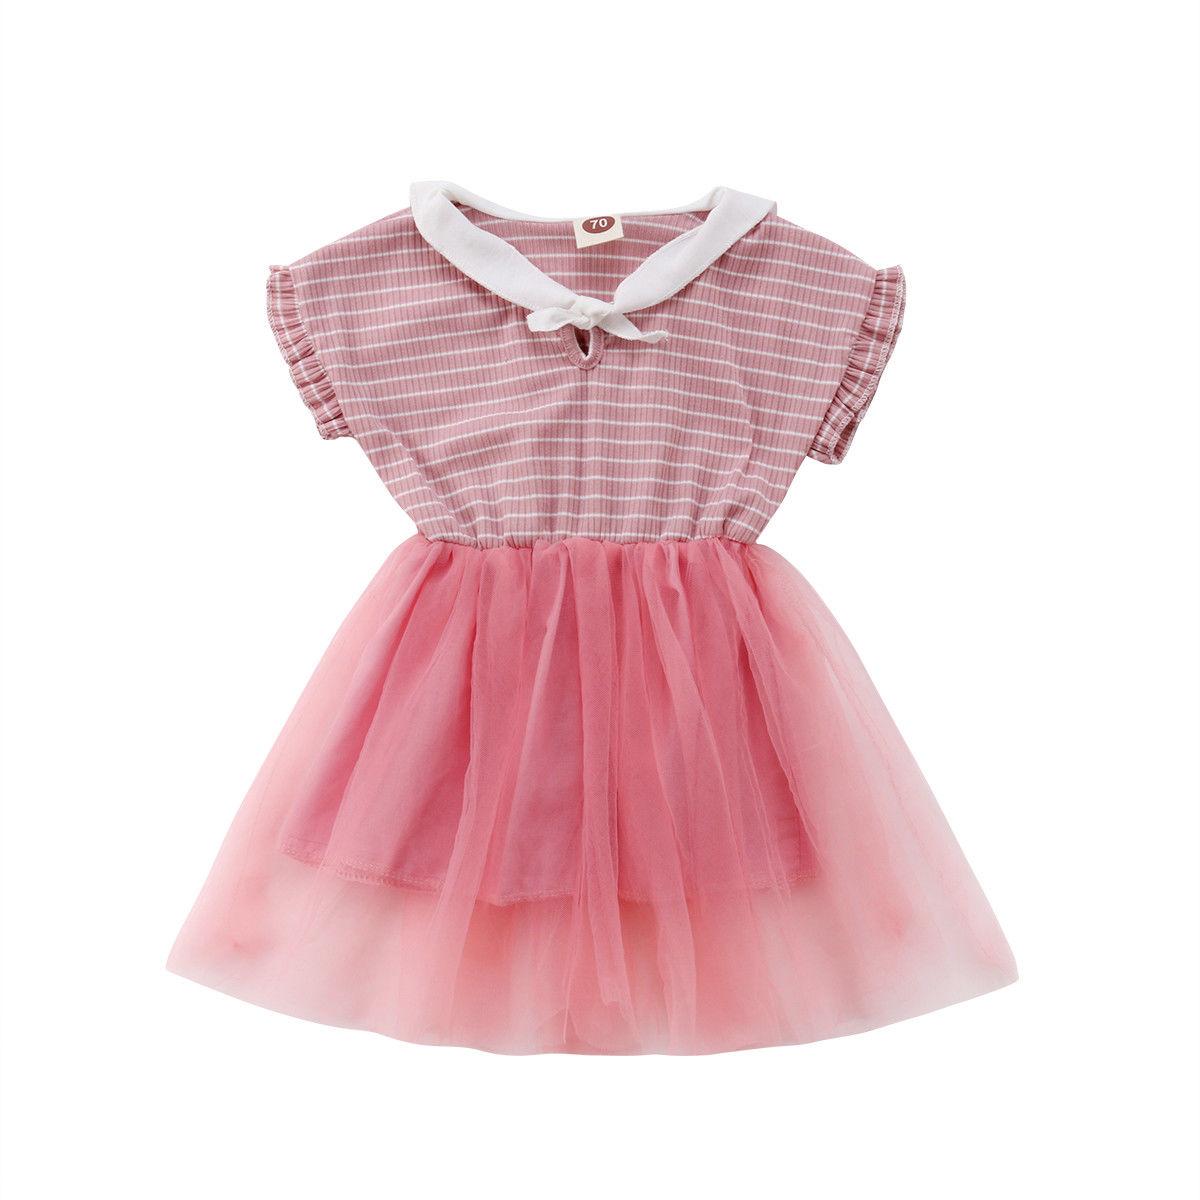 US Newborn Baby Girl Lace Tutu Short Sleeve Dress Party Wedding Princess Dresses